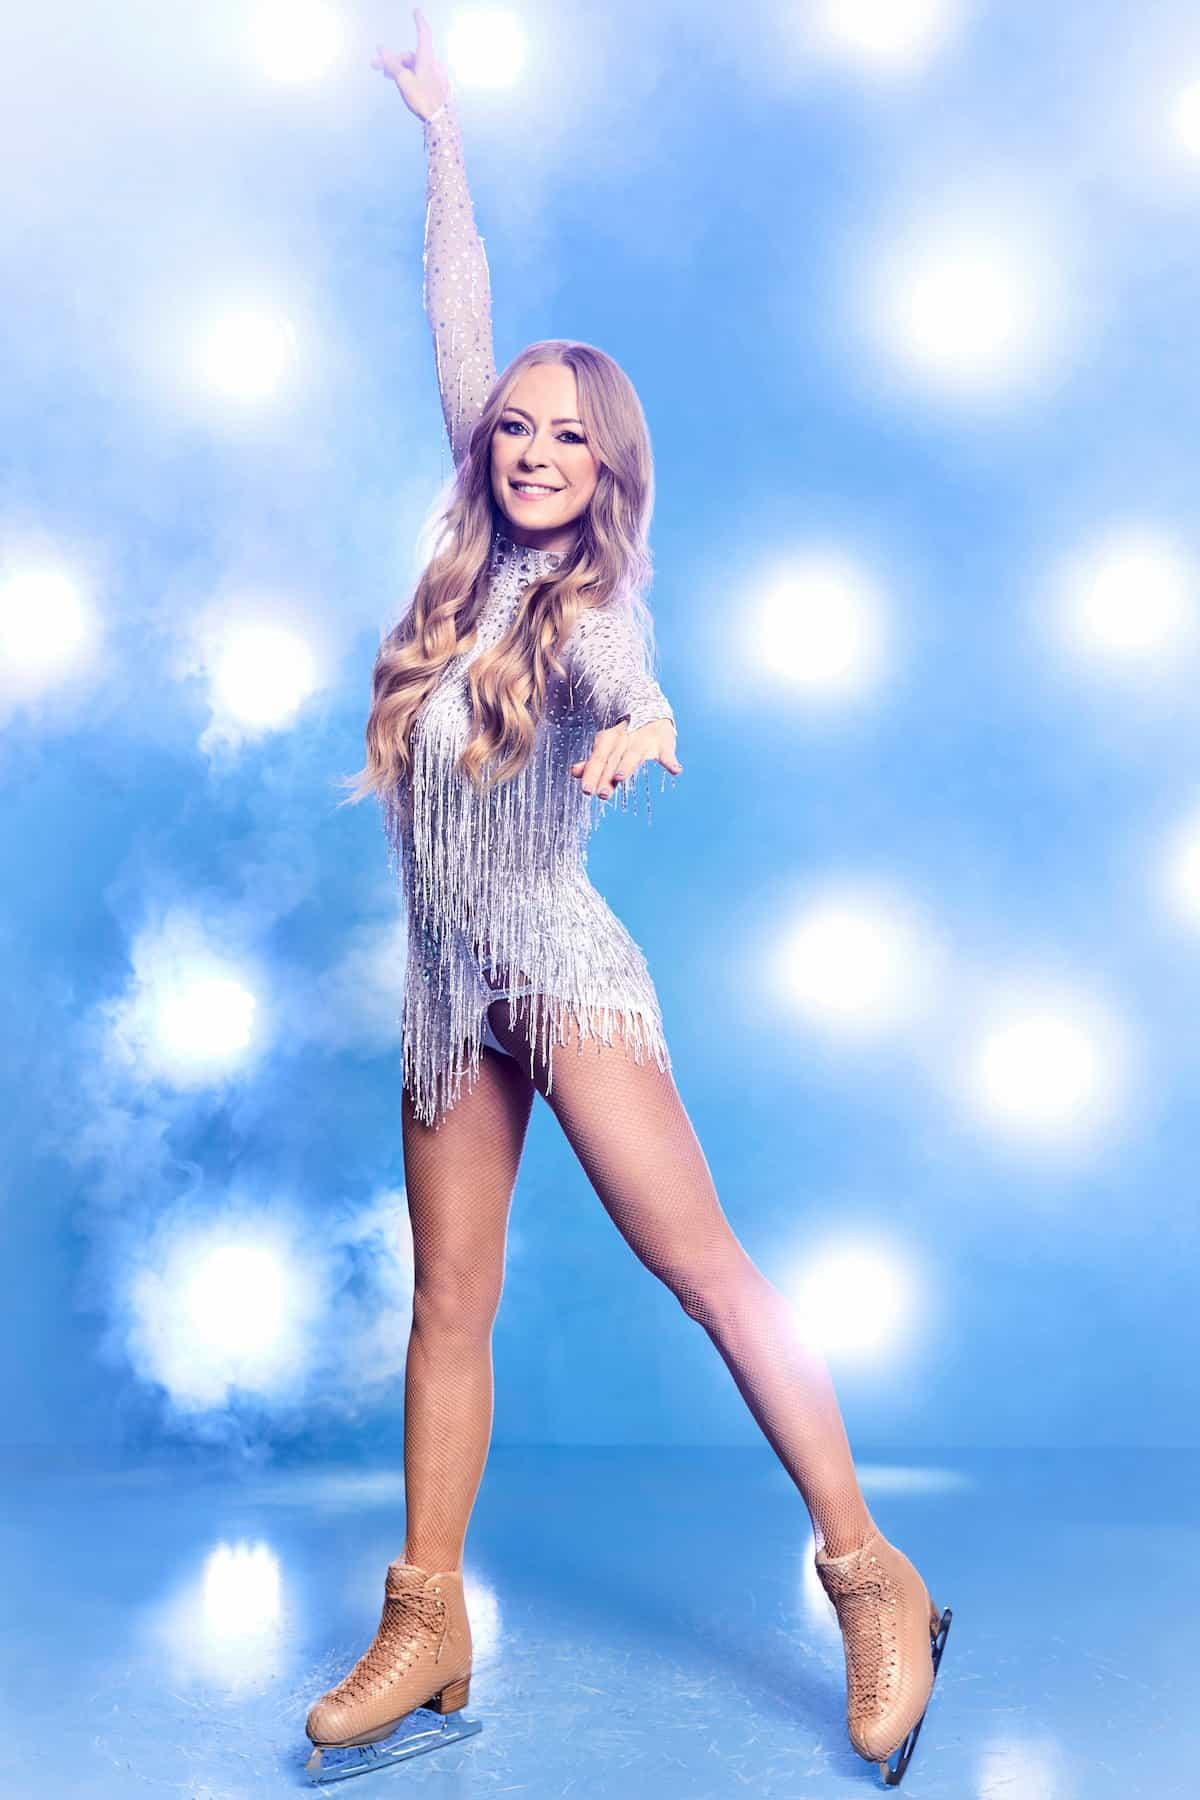 Jenny Elvers Promi-Kandidatin Dancing on Ice 2019 Herbst-Winter 2te Staffel